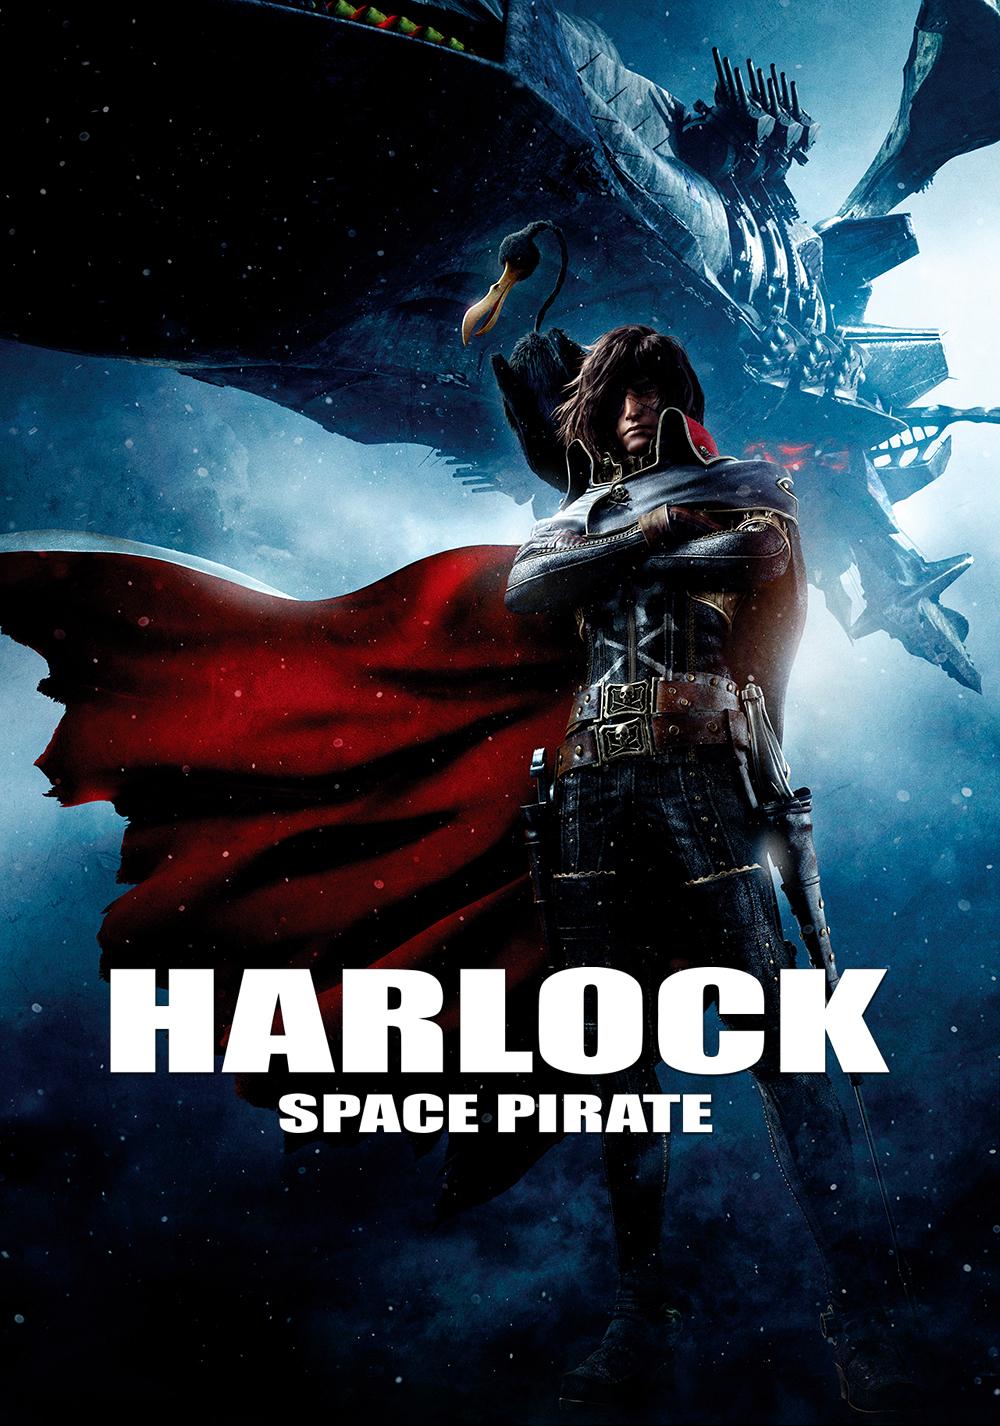 space pirate captain harlock 2